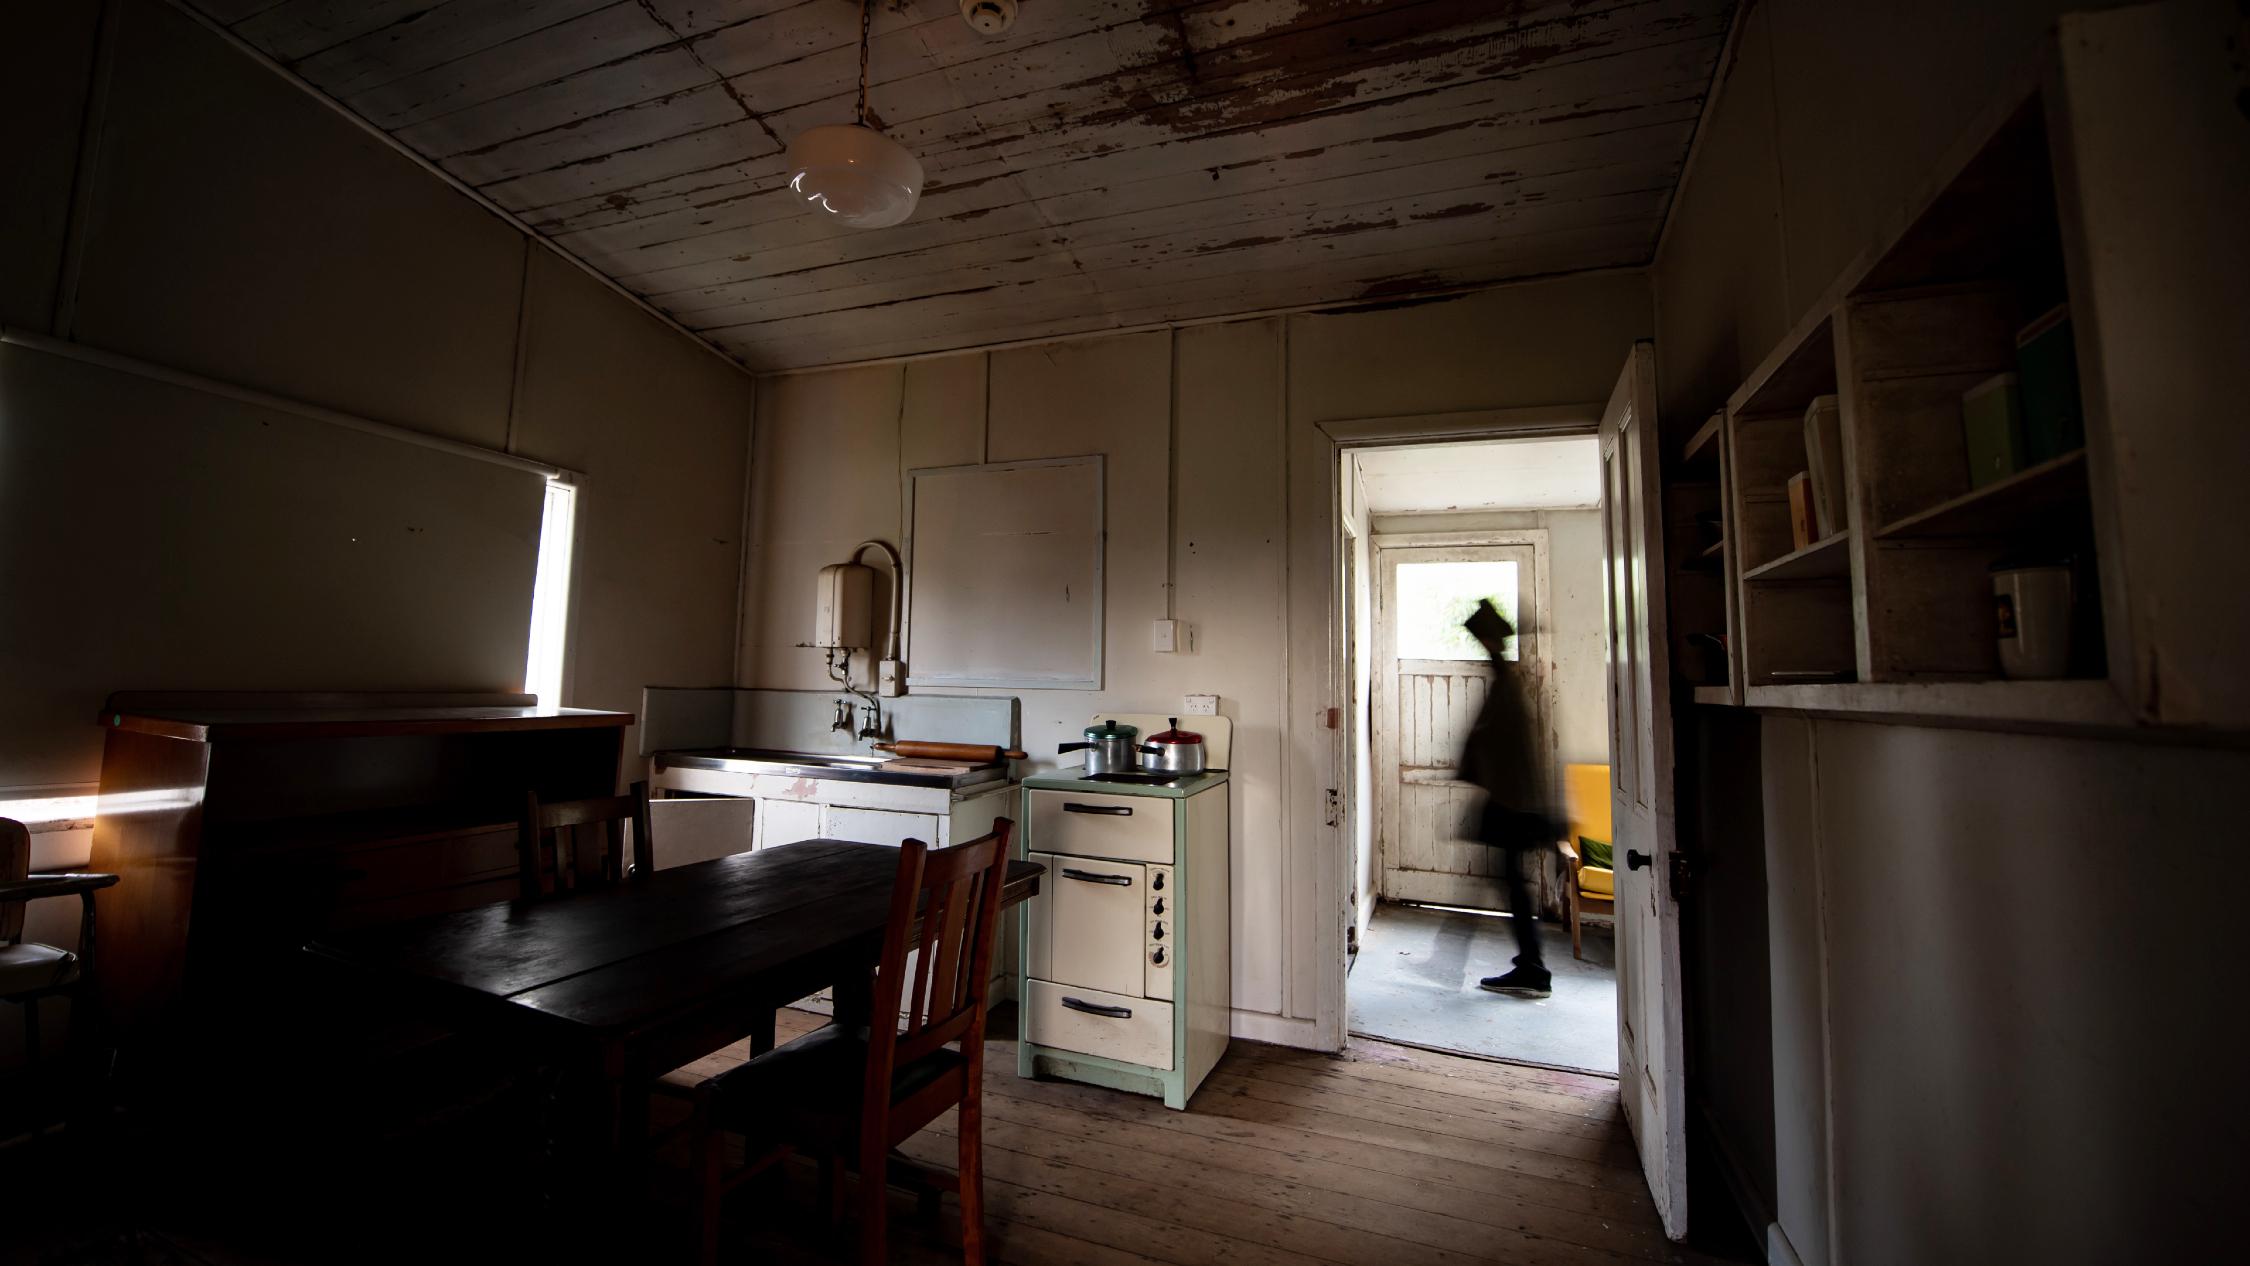 The Gravedigger's Cottage kitchen